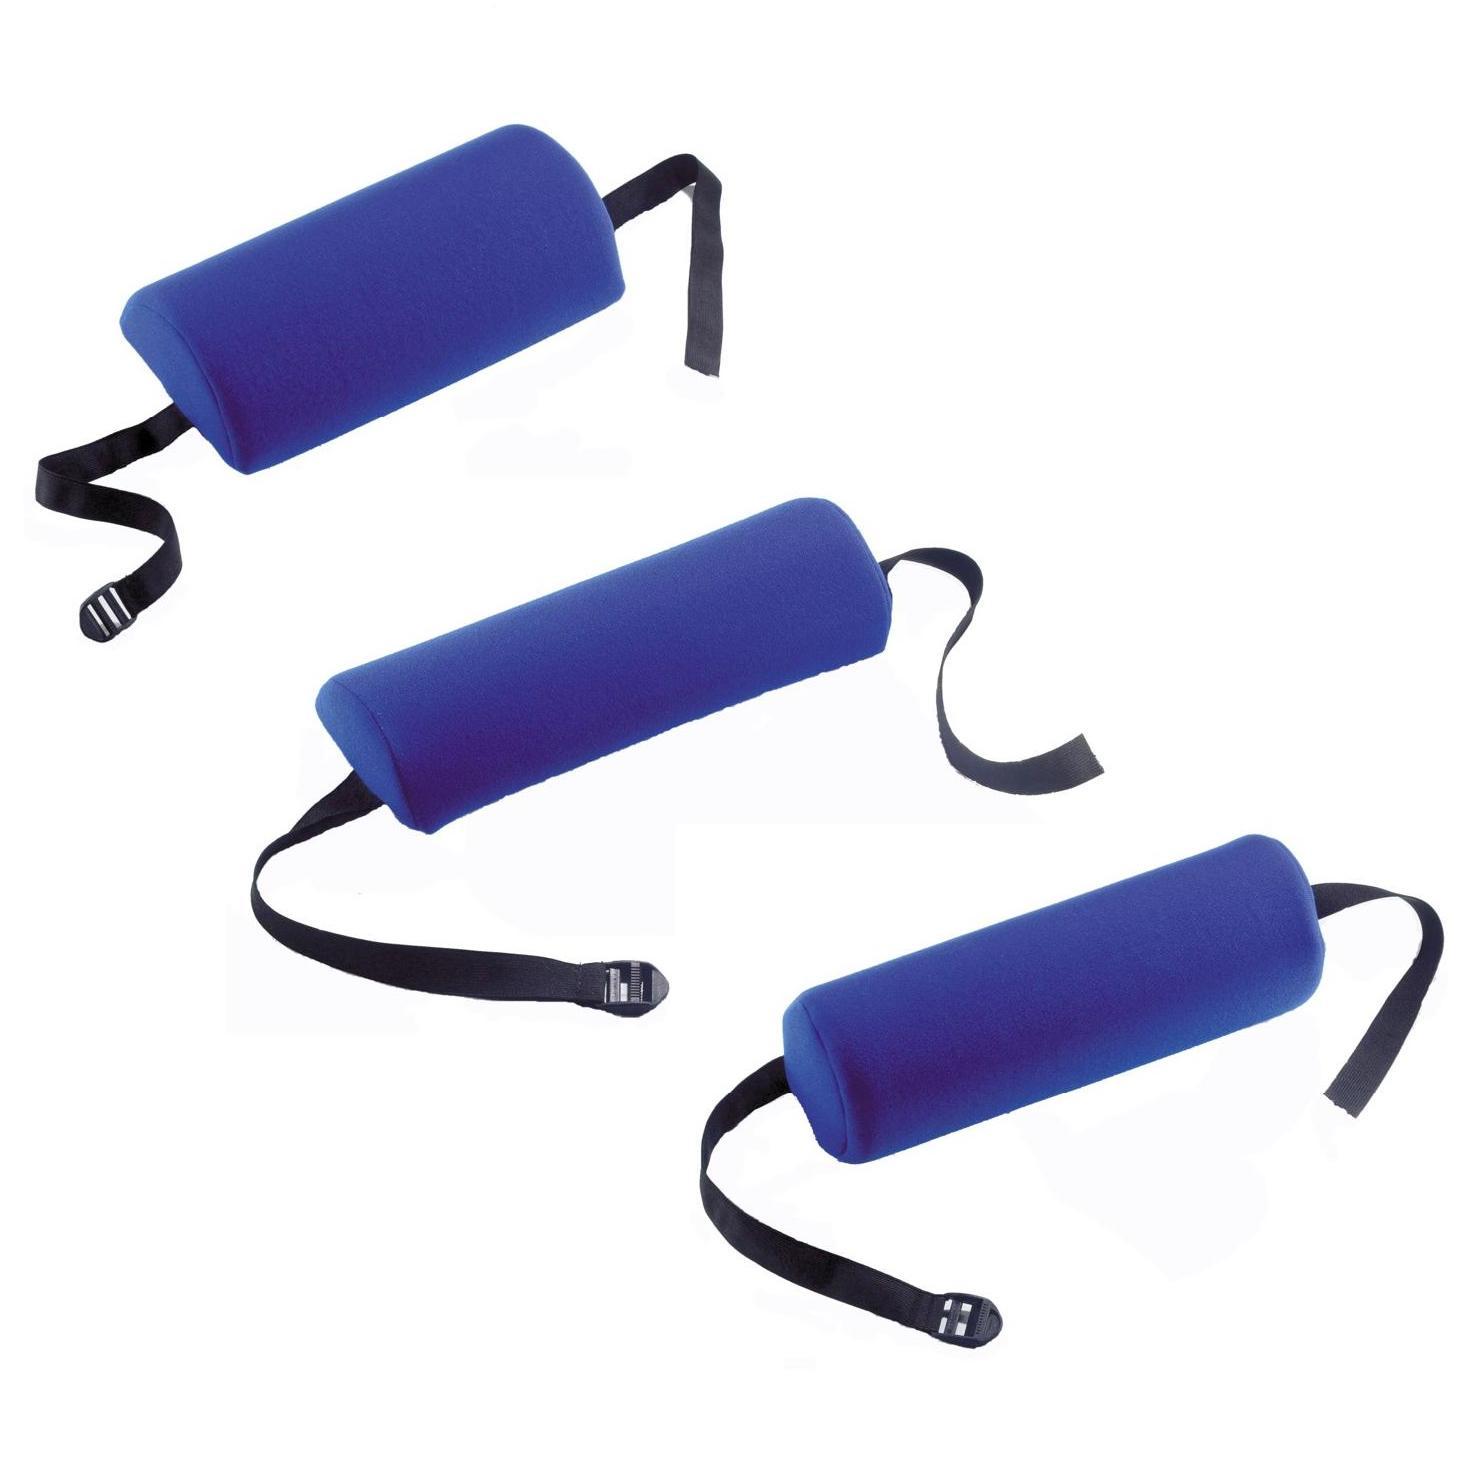 Cojines lumbares lumbar rolls productos de farmacia for Cojin lumbar silla oficina